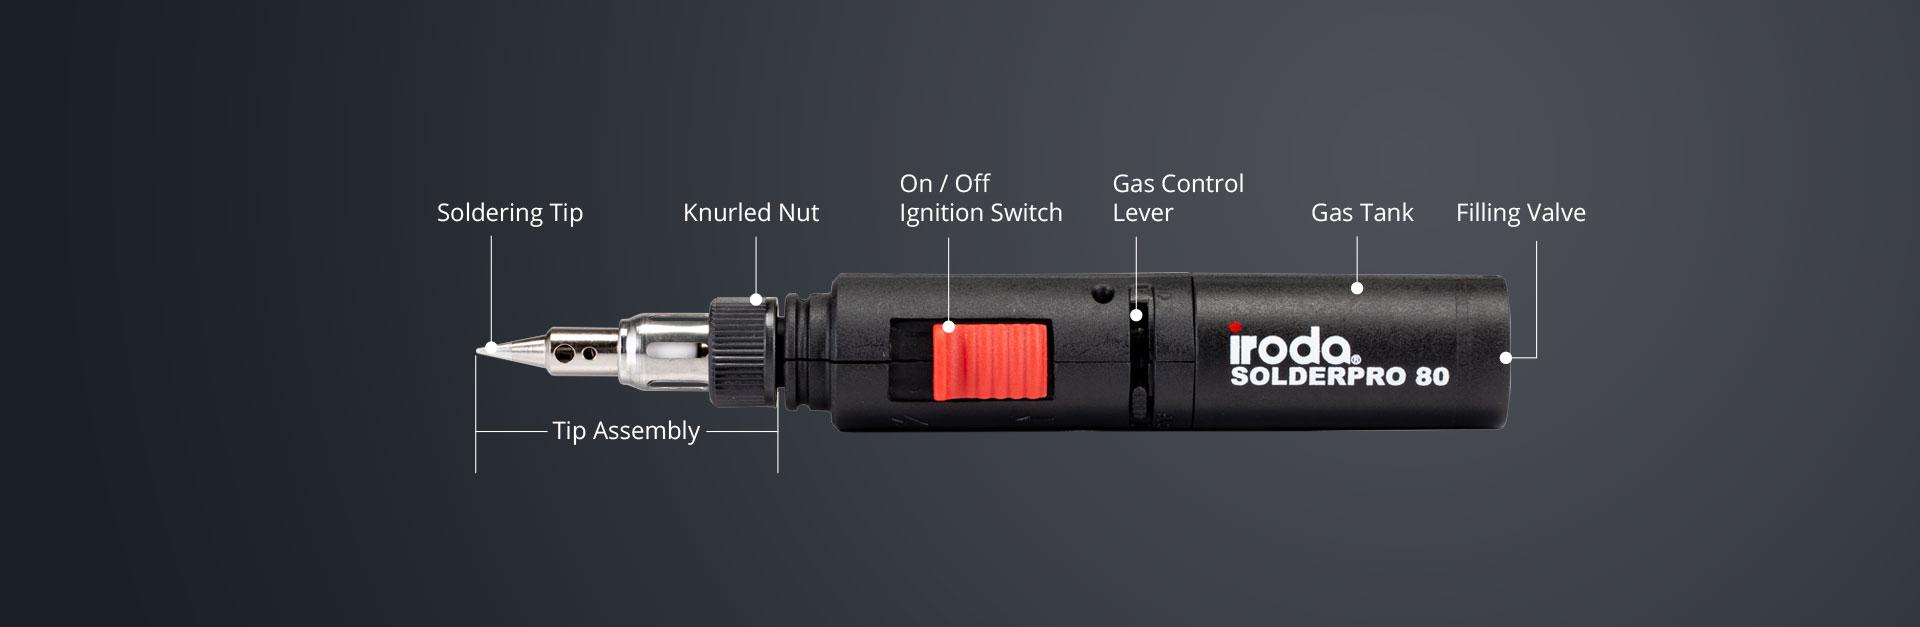 Horizontal Description of SOLDERPRO 80 Pocket size Lite Professional Butane Soldering Iron from Pro-Iroda